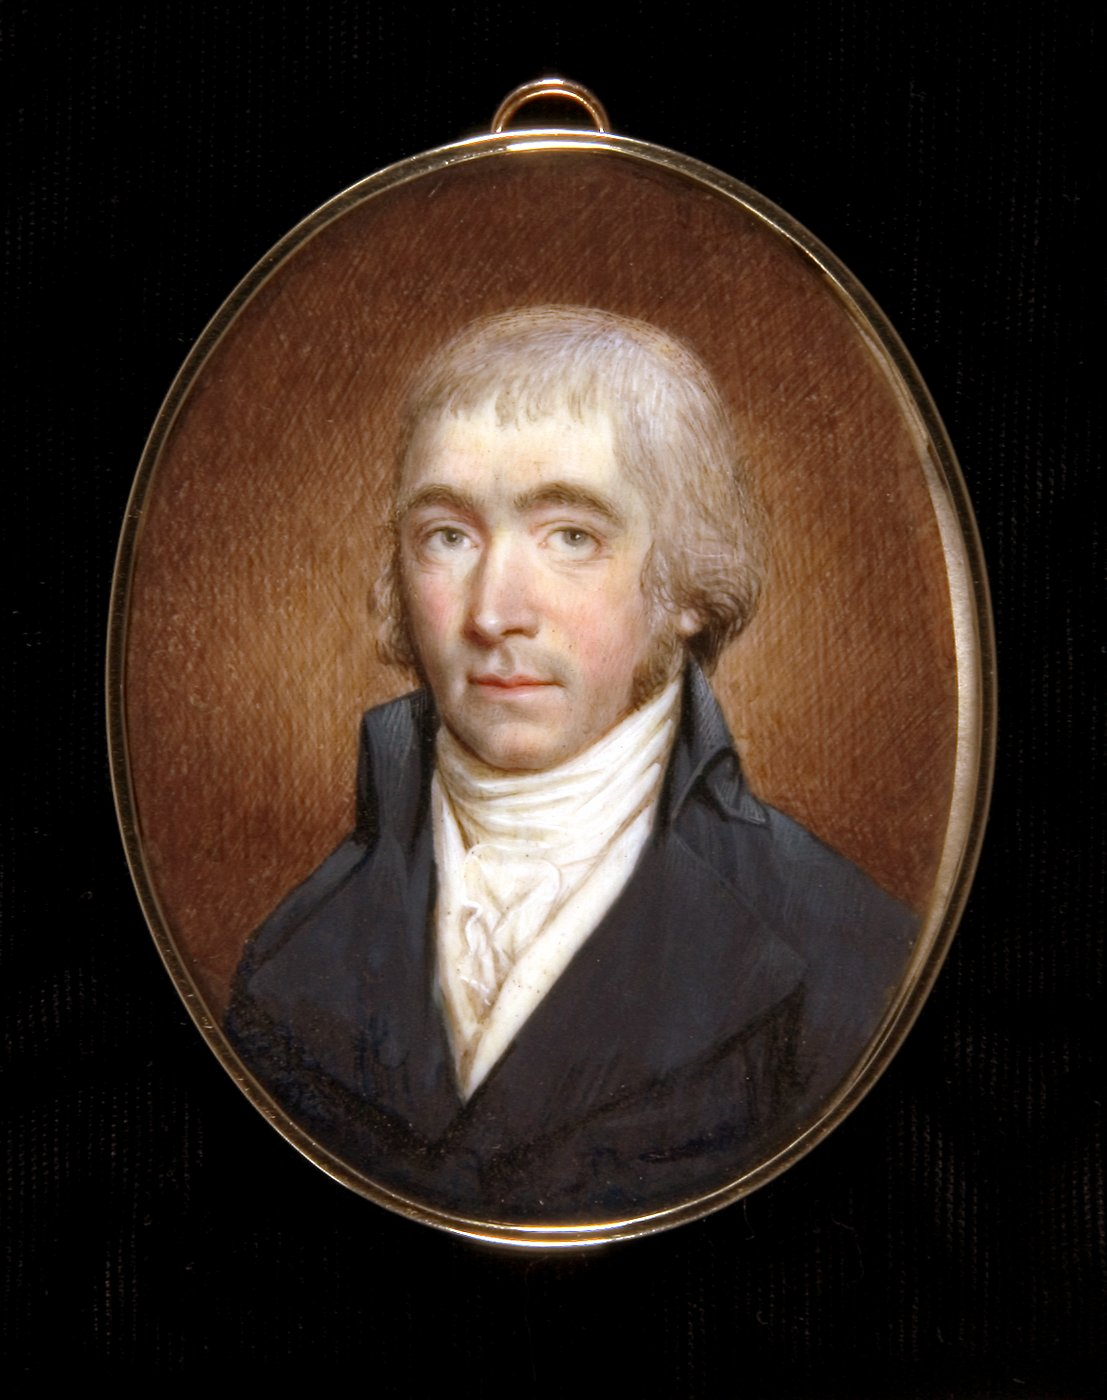 George Fisher miniature portrait by Raphaelle Peale (1795)